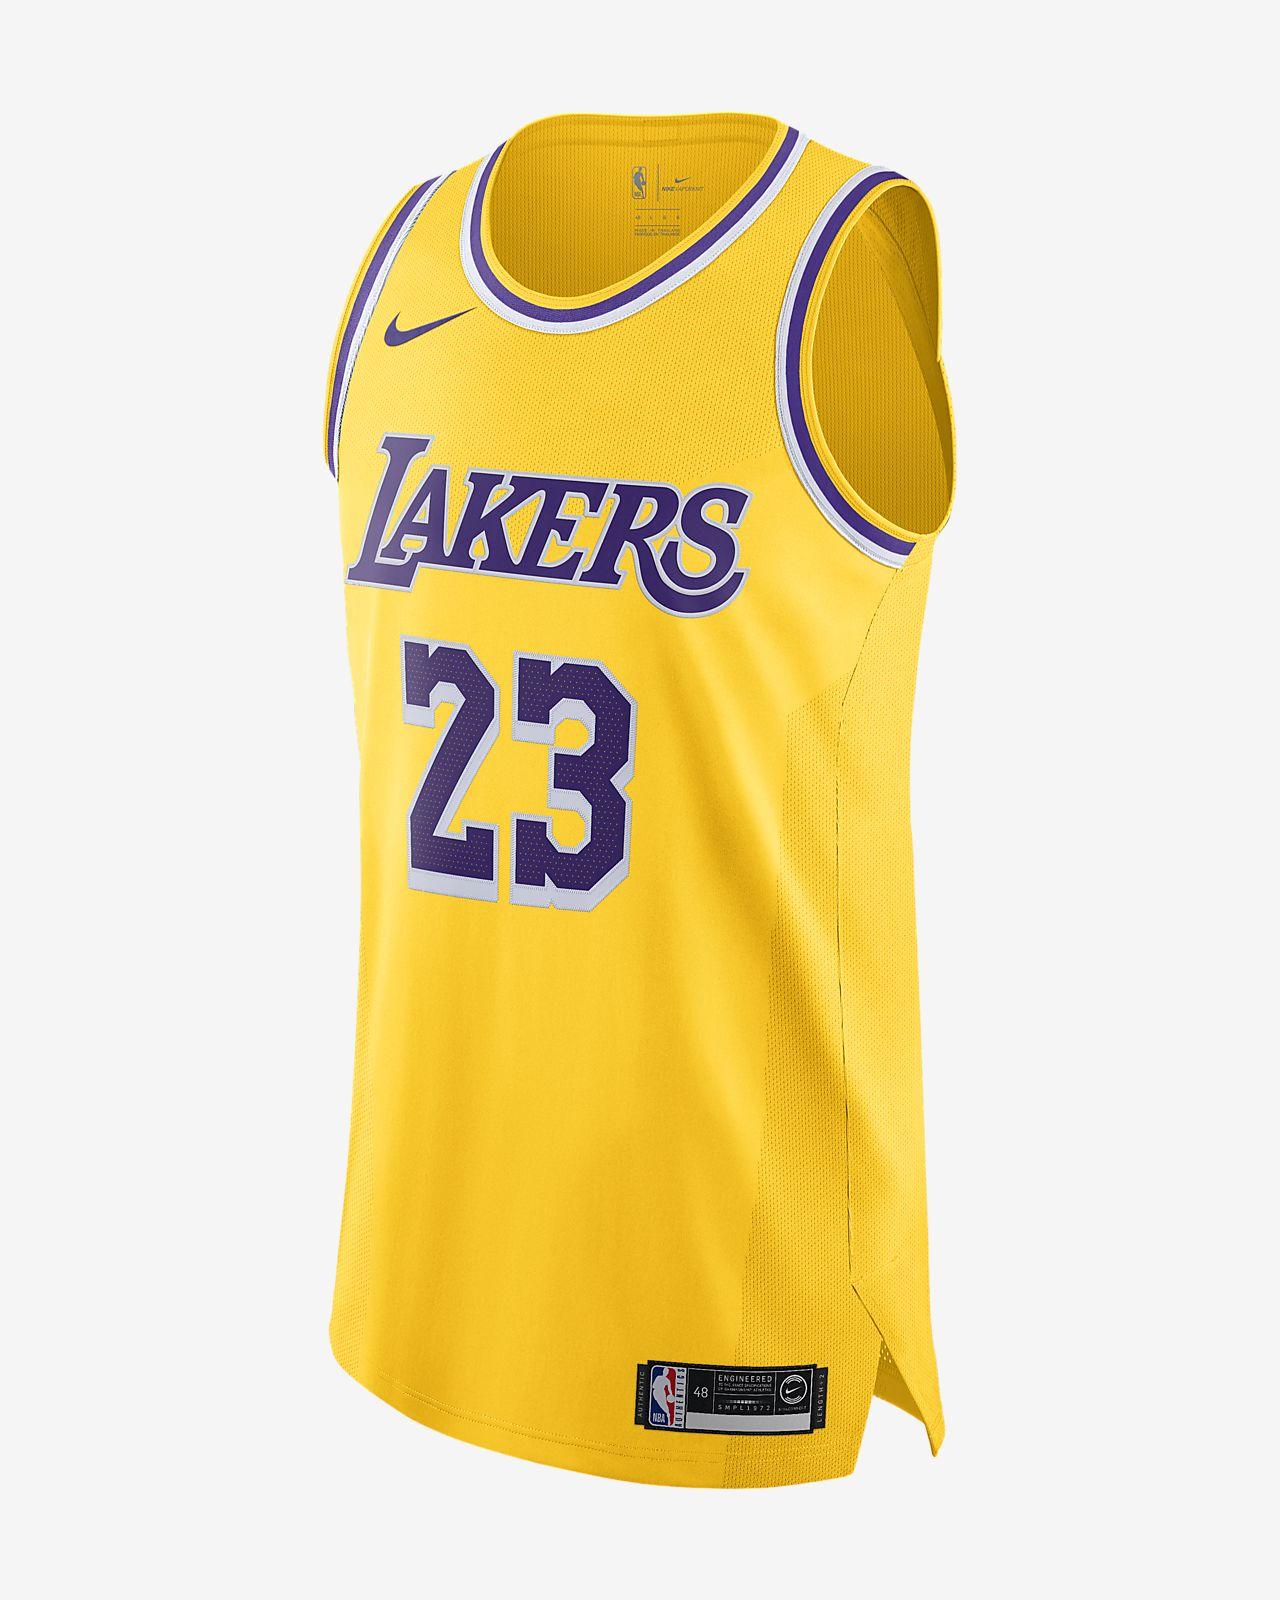 427f20d0ab1 ... Męska koszulka Nike NBA Connected LeBron James Icon Edition Authentic  (Los Angeles Lakers)